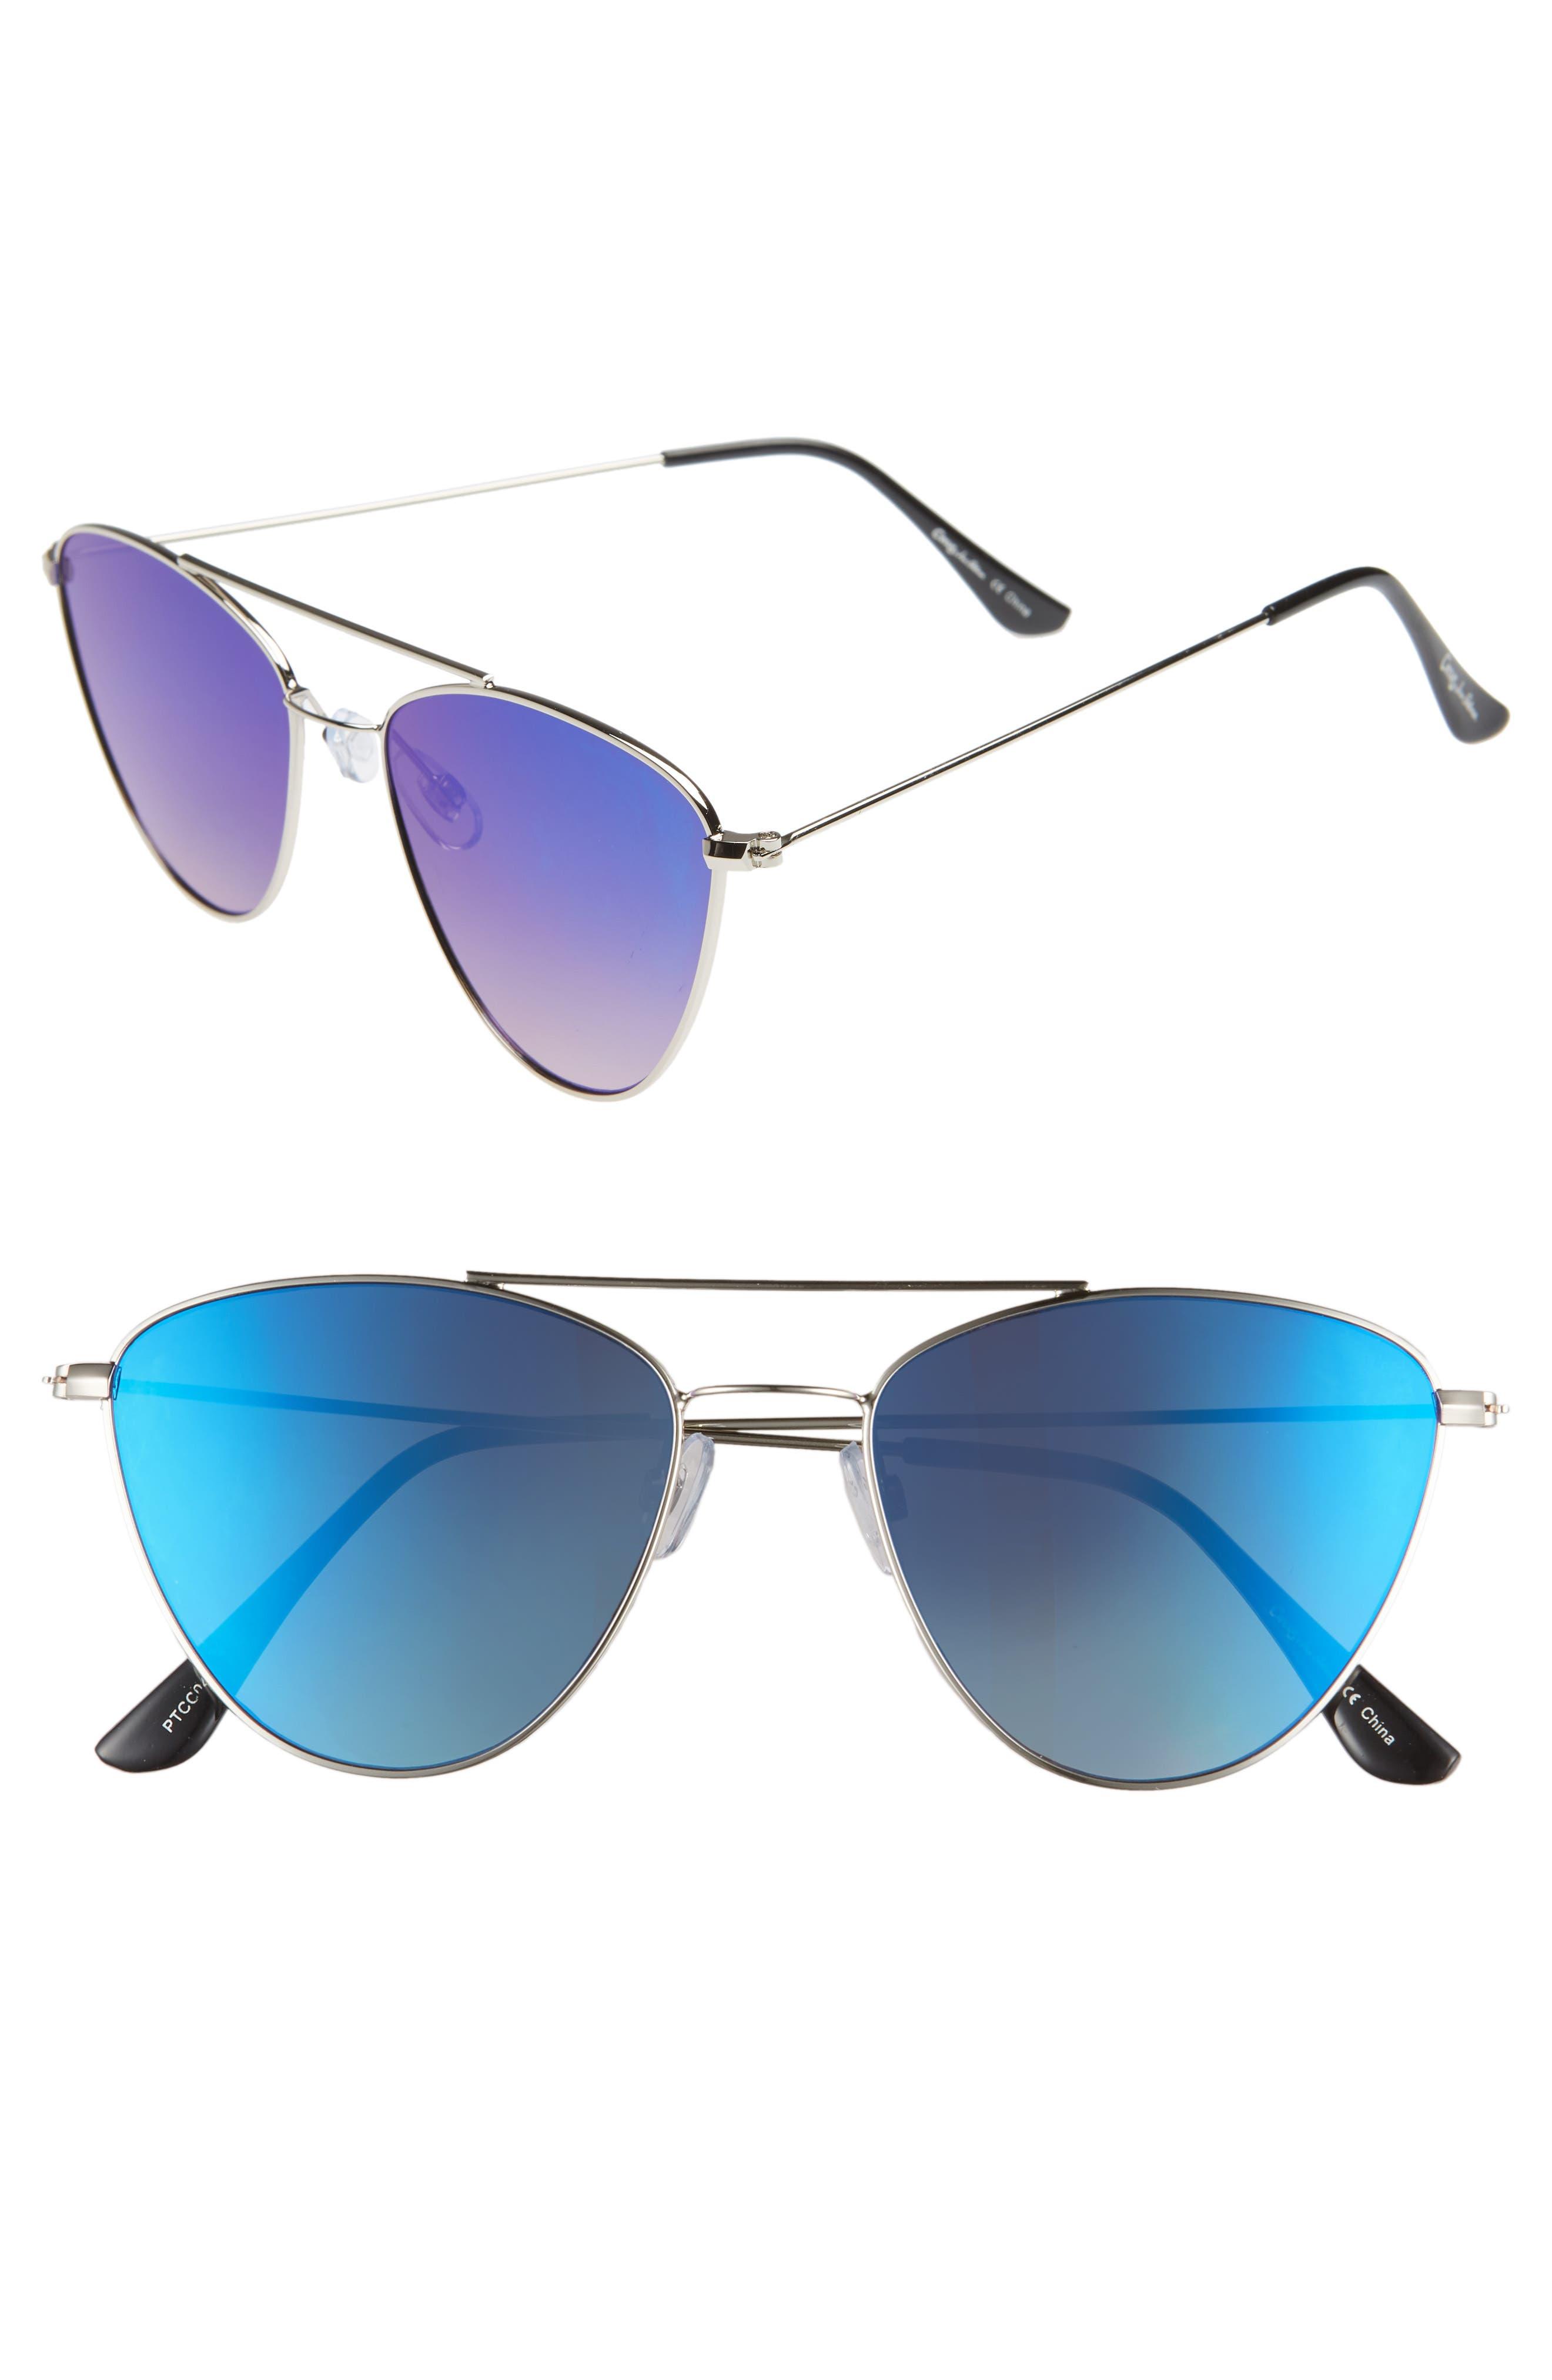 CIRCUS BY SAM EDELMAN 57Mm Mirrored Cat Eye Sunglasses - Silver/ Blue Mirror